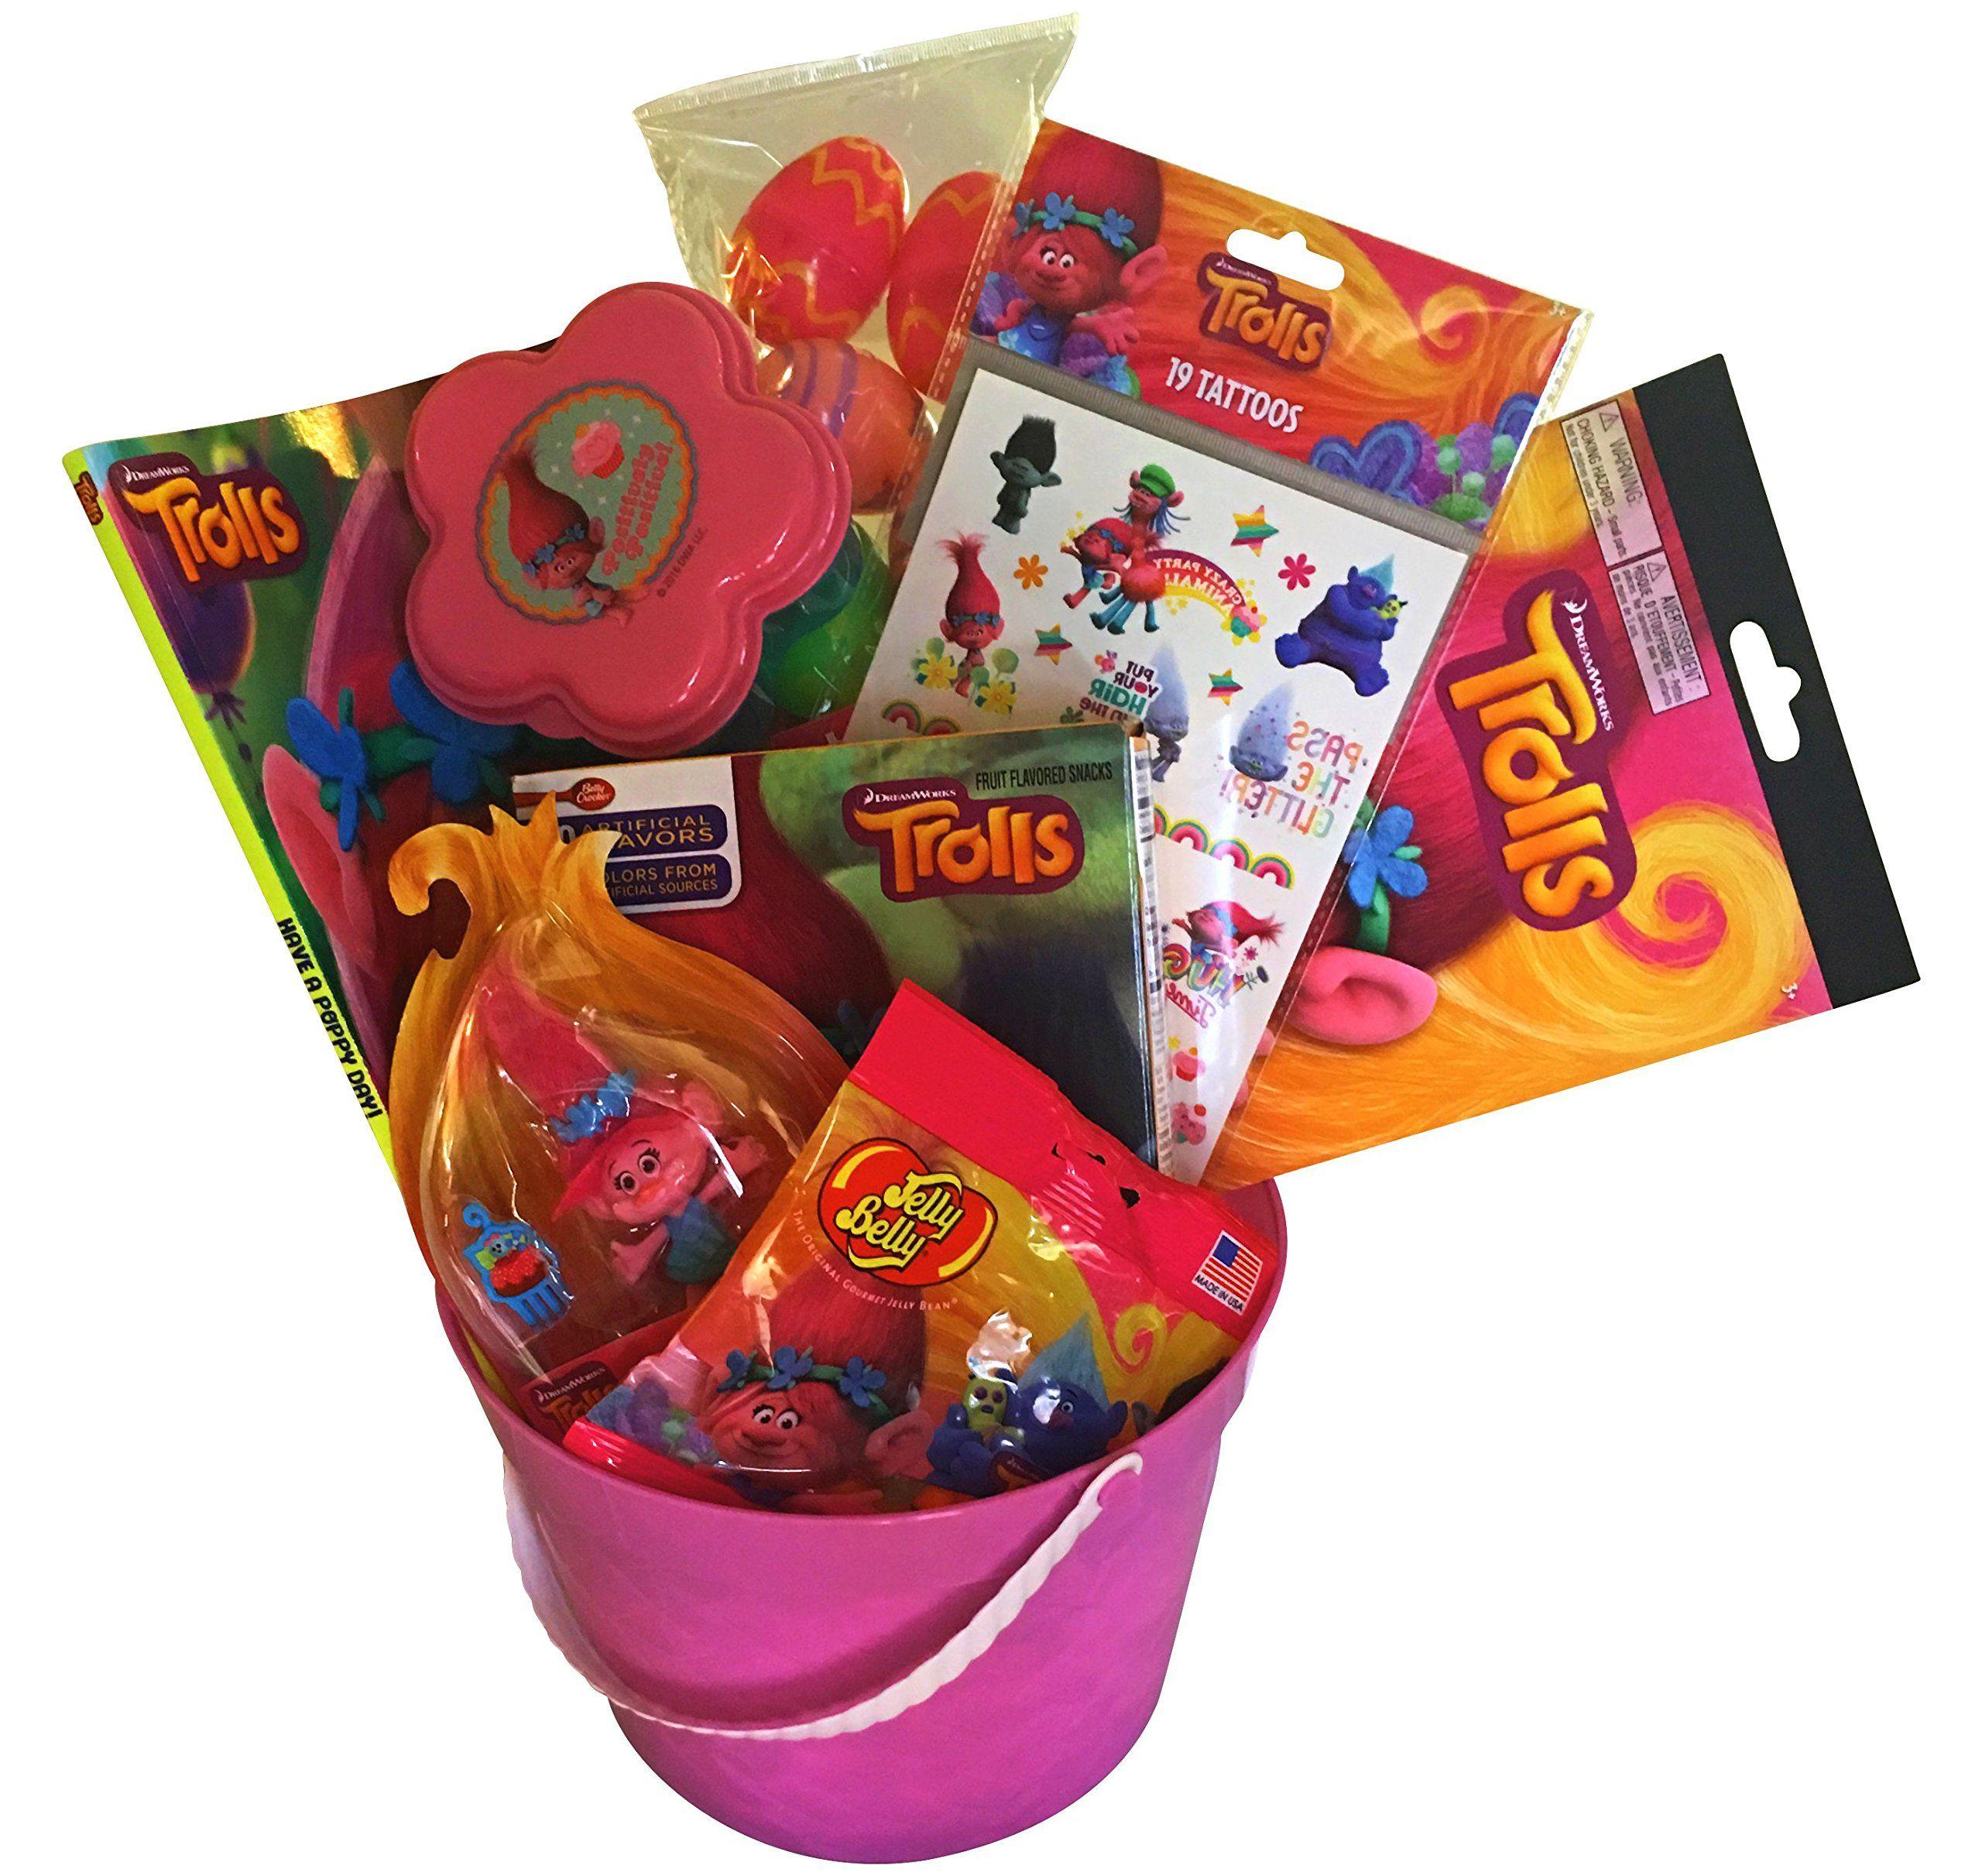 Troll easter basket perfect gift basket get well birthday and troll easter basket perfect gift basket get well birthday and other occasions negle Images